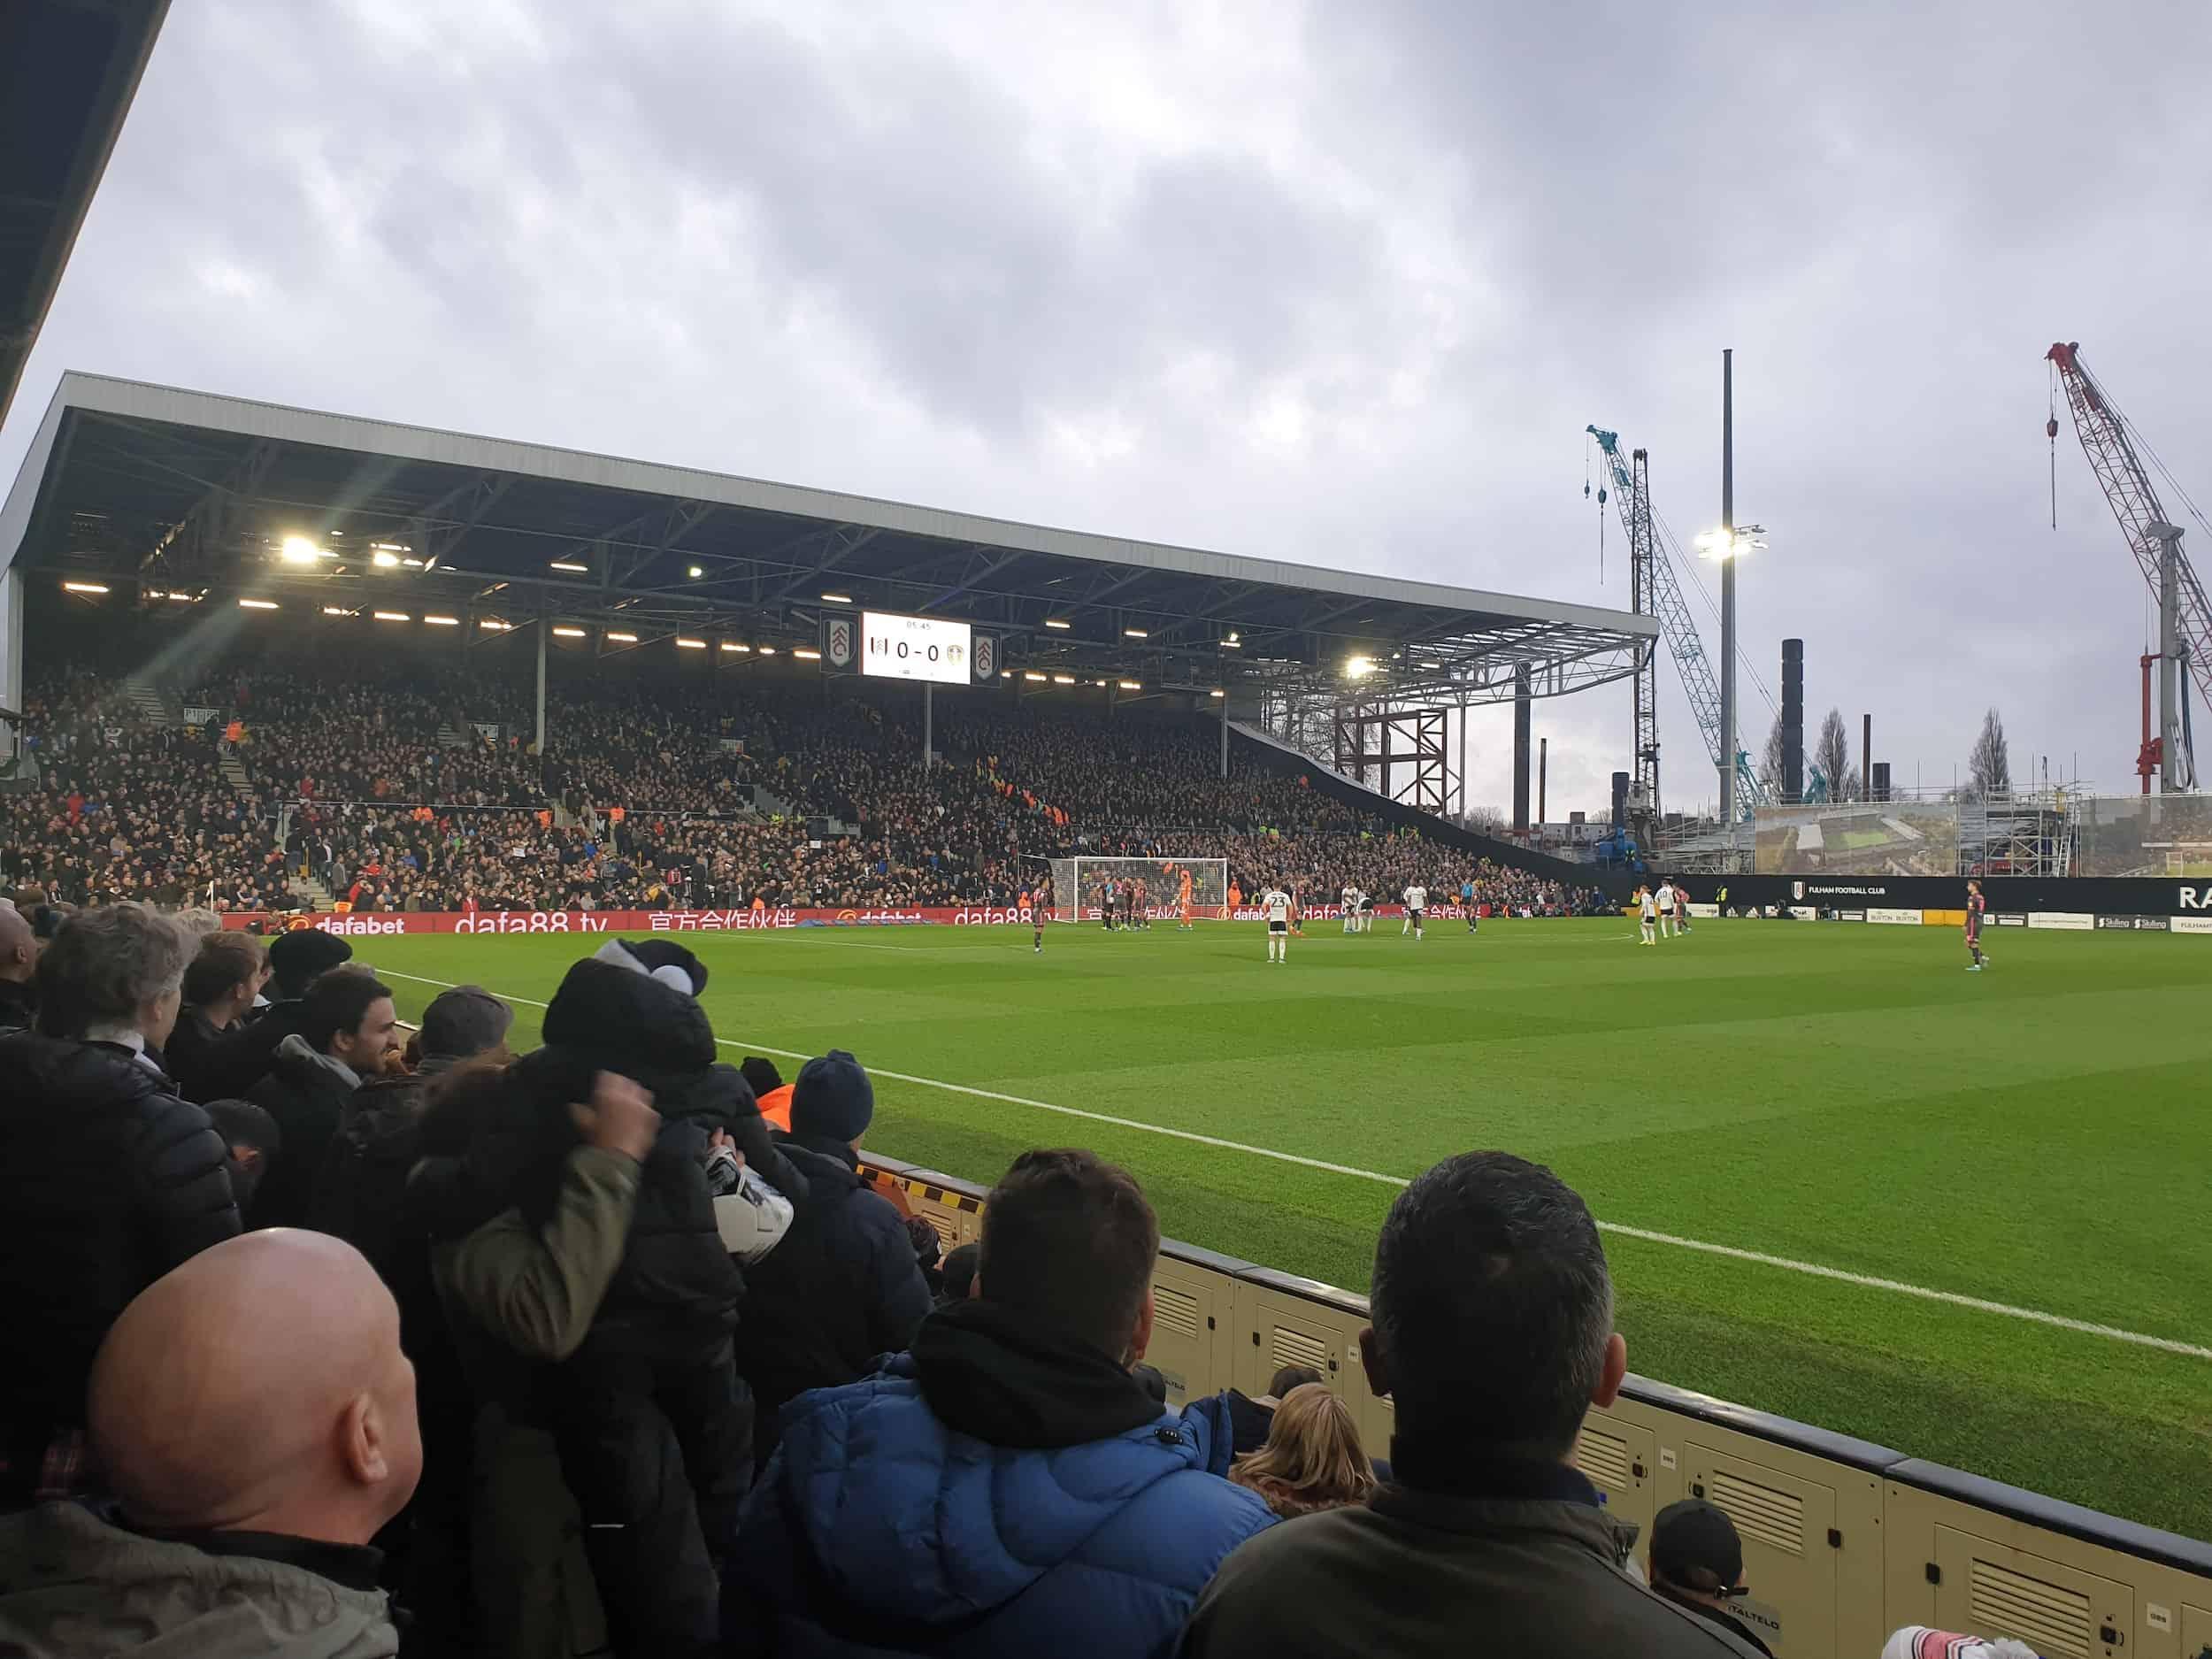 Championship fodbold i London: Fulham FC - Leeds United